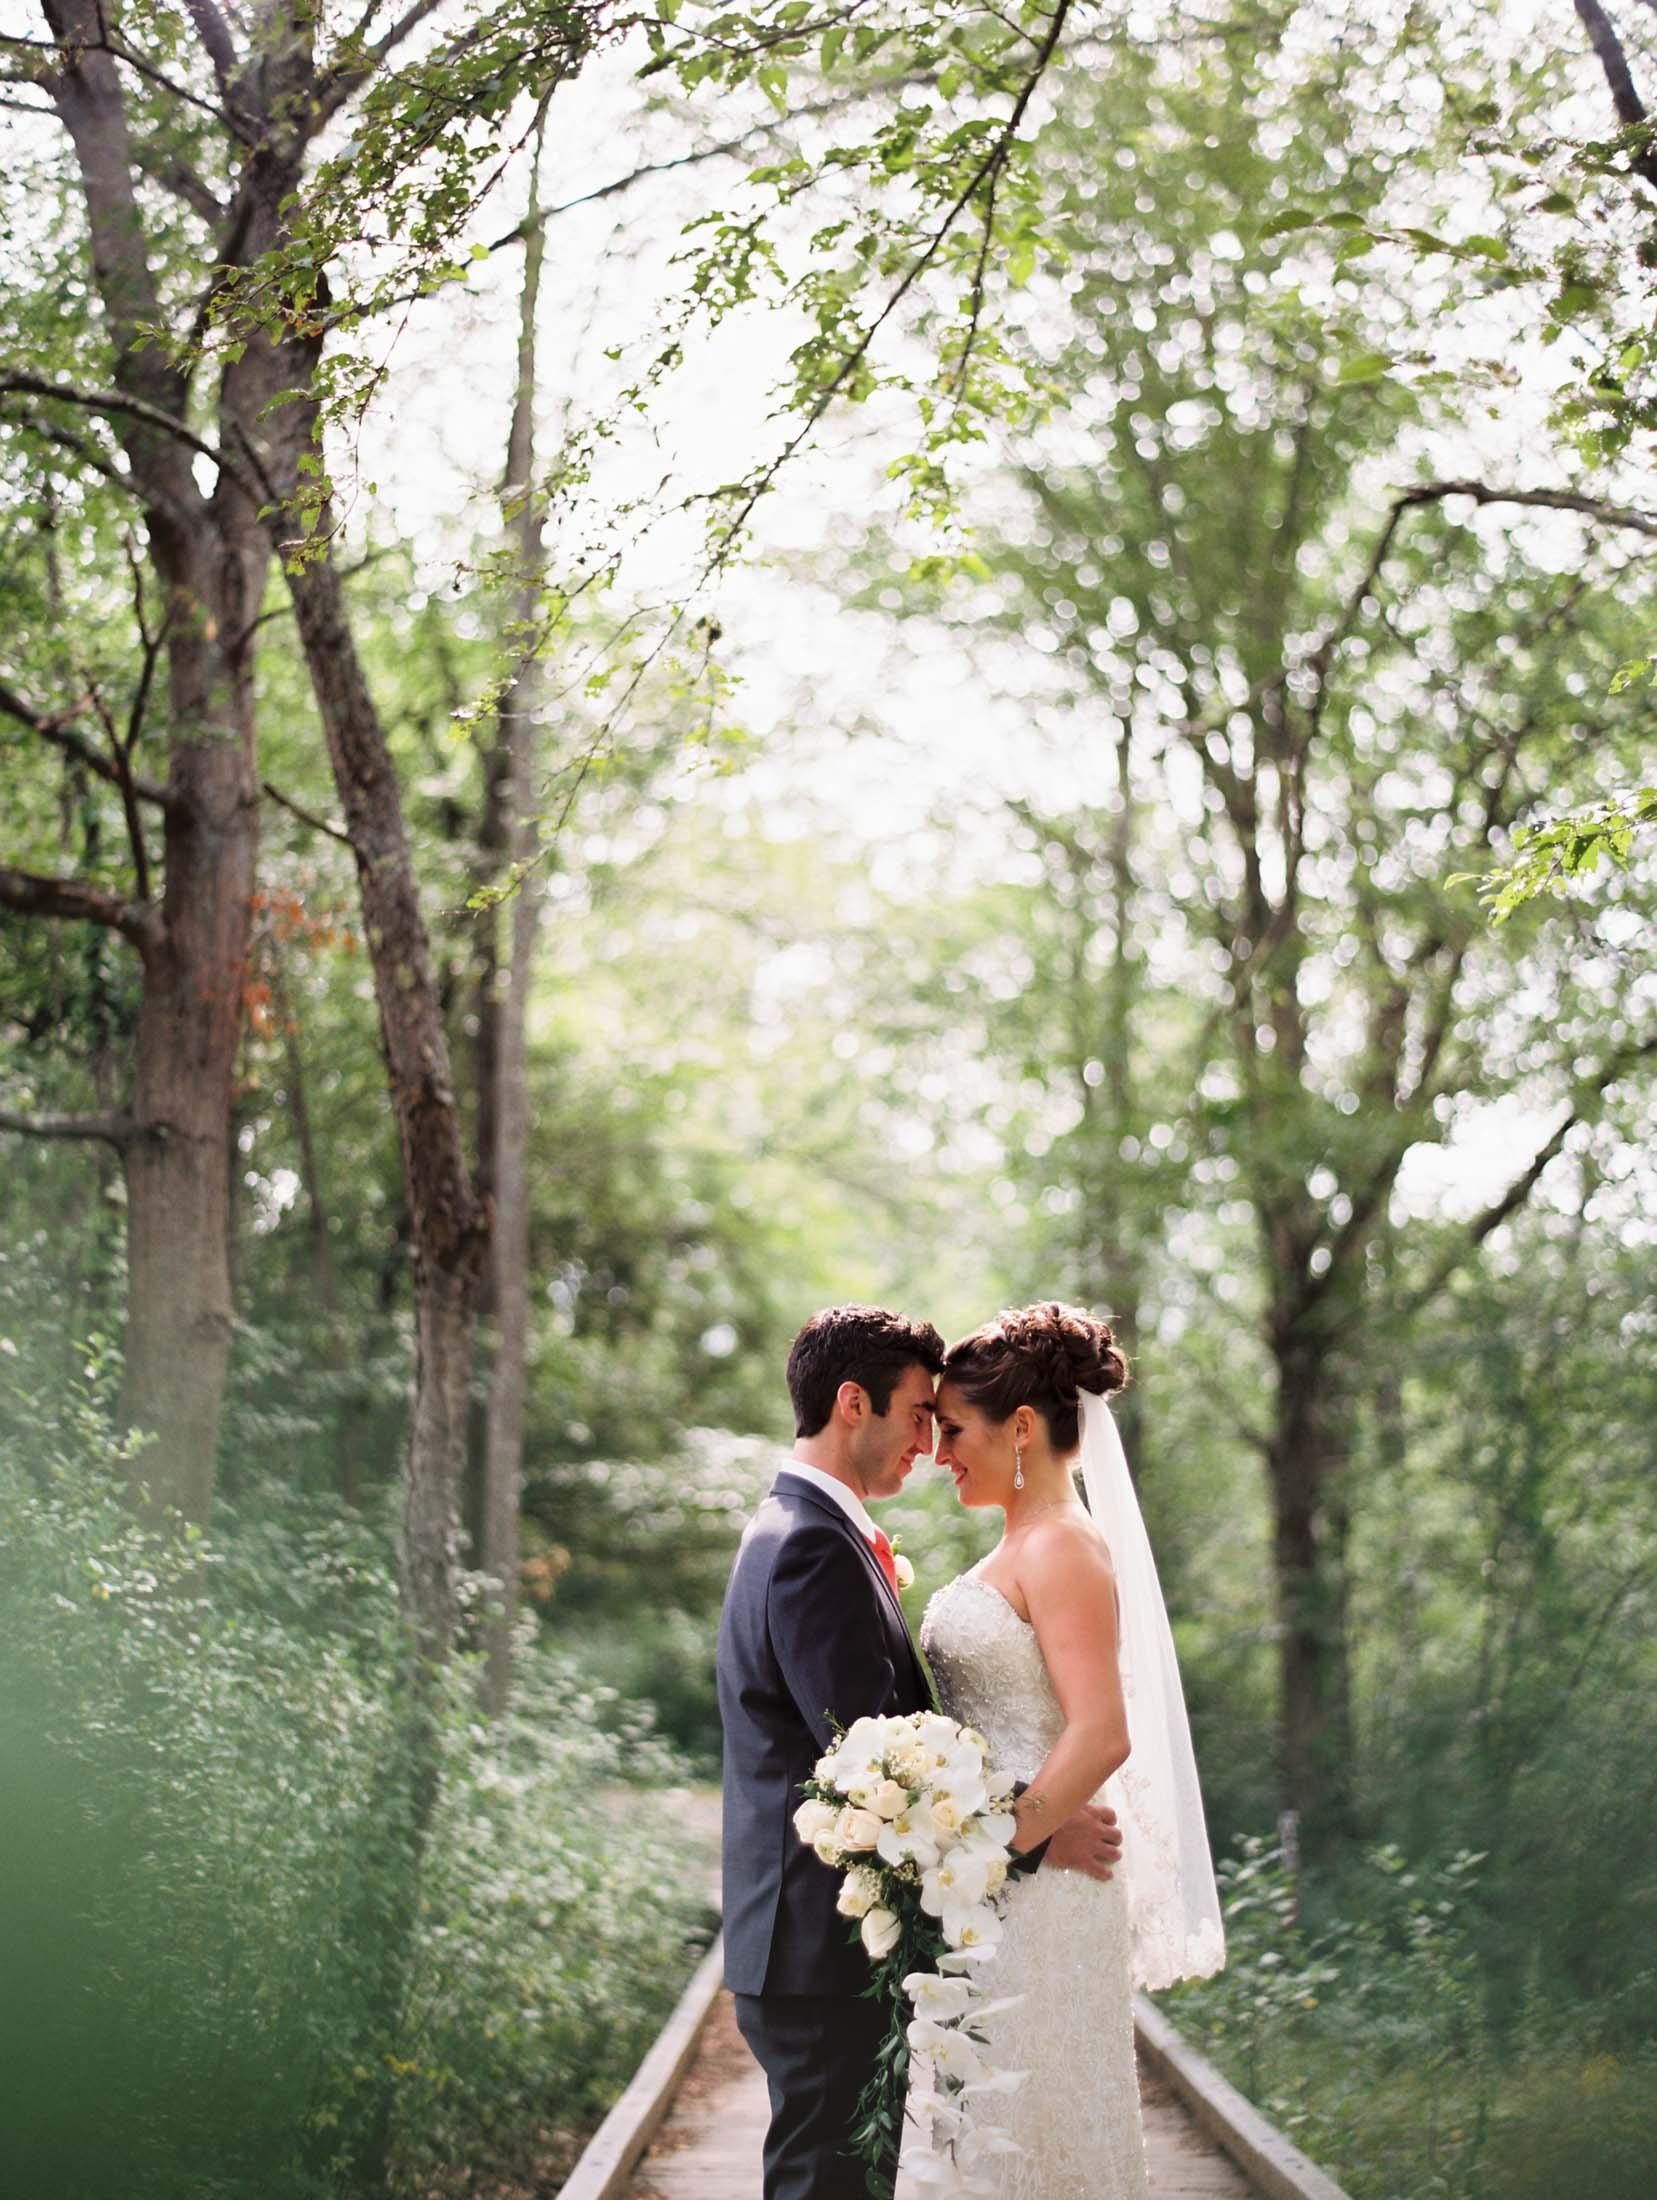 Willowdale-wedding-photography-10.jpg